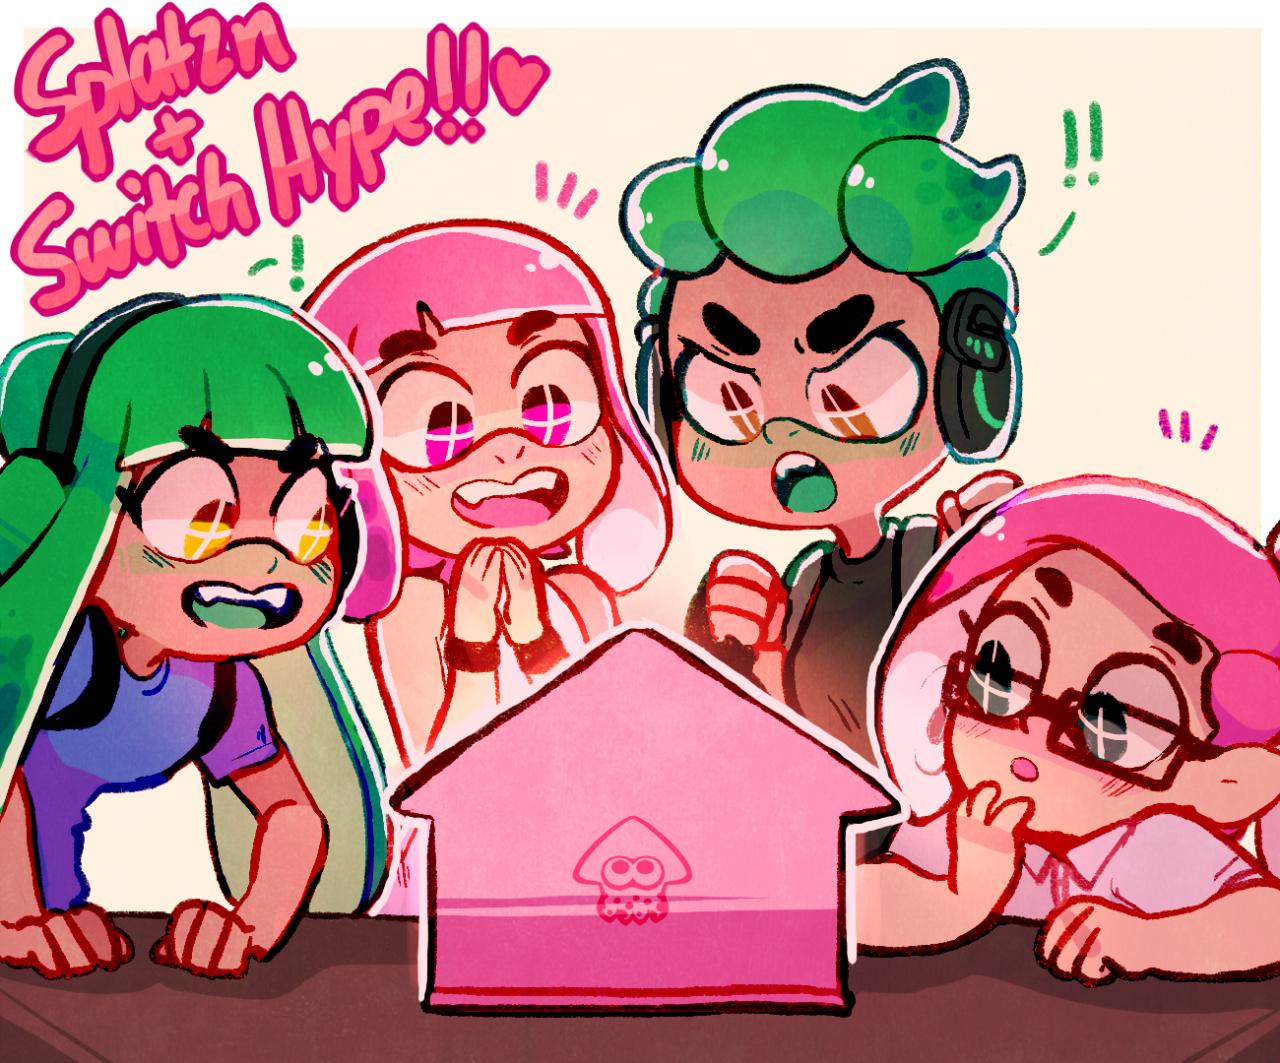 4700+ followers! Splatoon squid, Game art, Anime